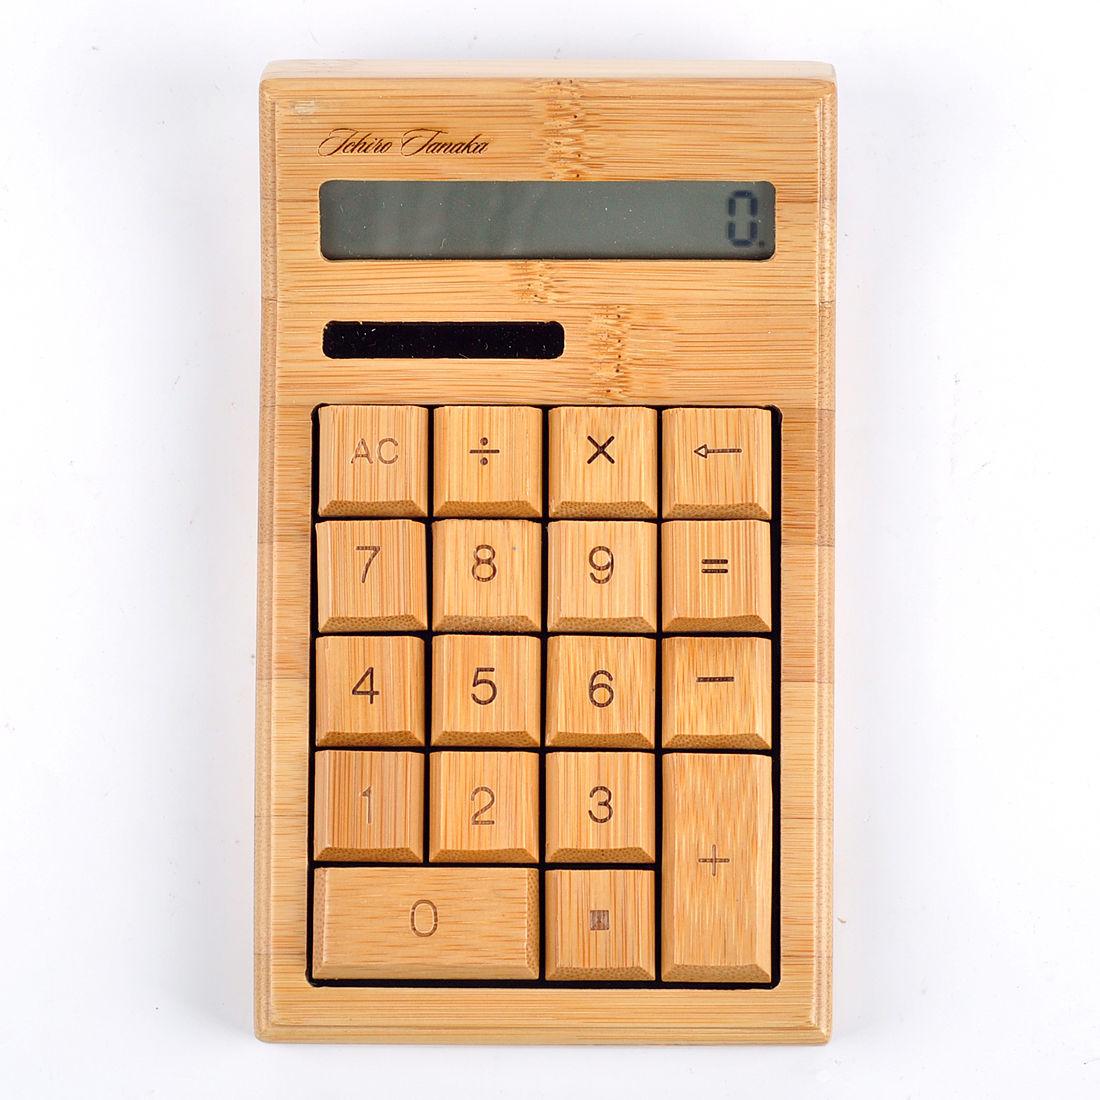 楽天市場 lifesign名入れ無料 生活用品 竹製ソーラー式計算機 電卓 b